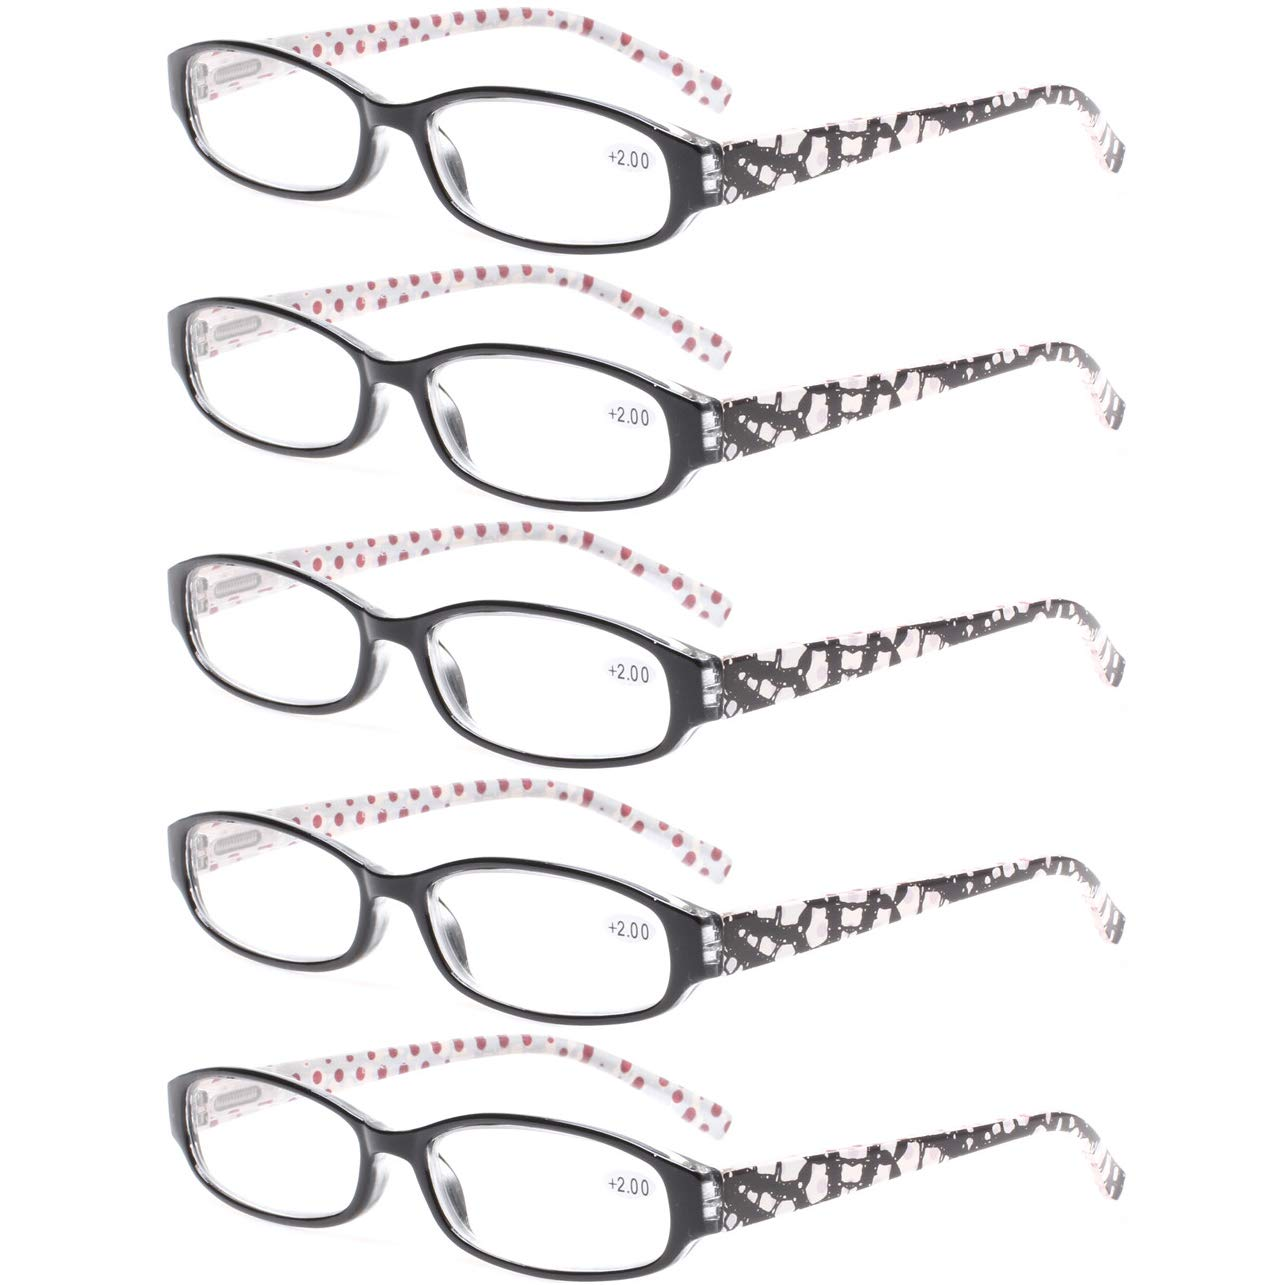 88e88d78fd8 Amazon.com  Reading Glasses Comb Pack of Multiple Classic Men and Women  Readers Spring Hinge Glasses (5 Pack Black